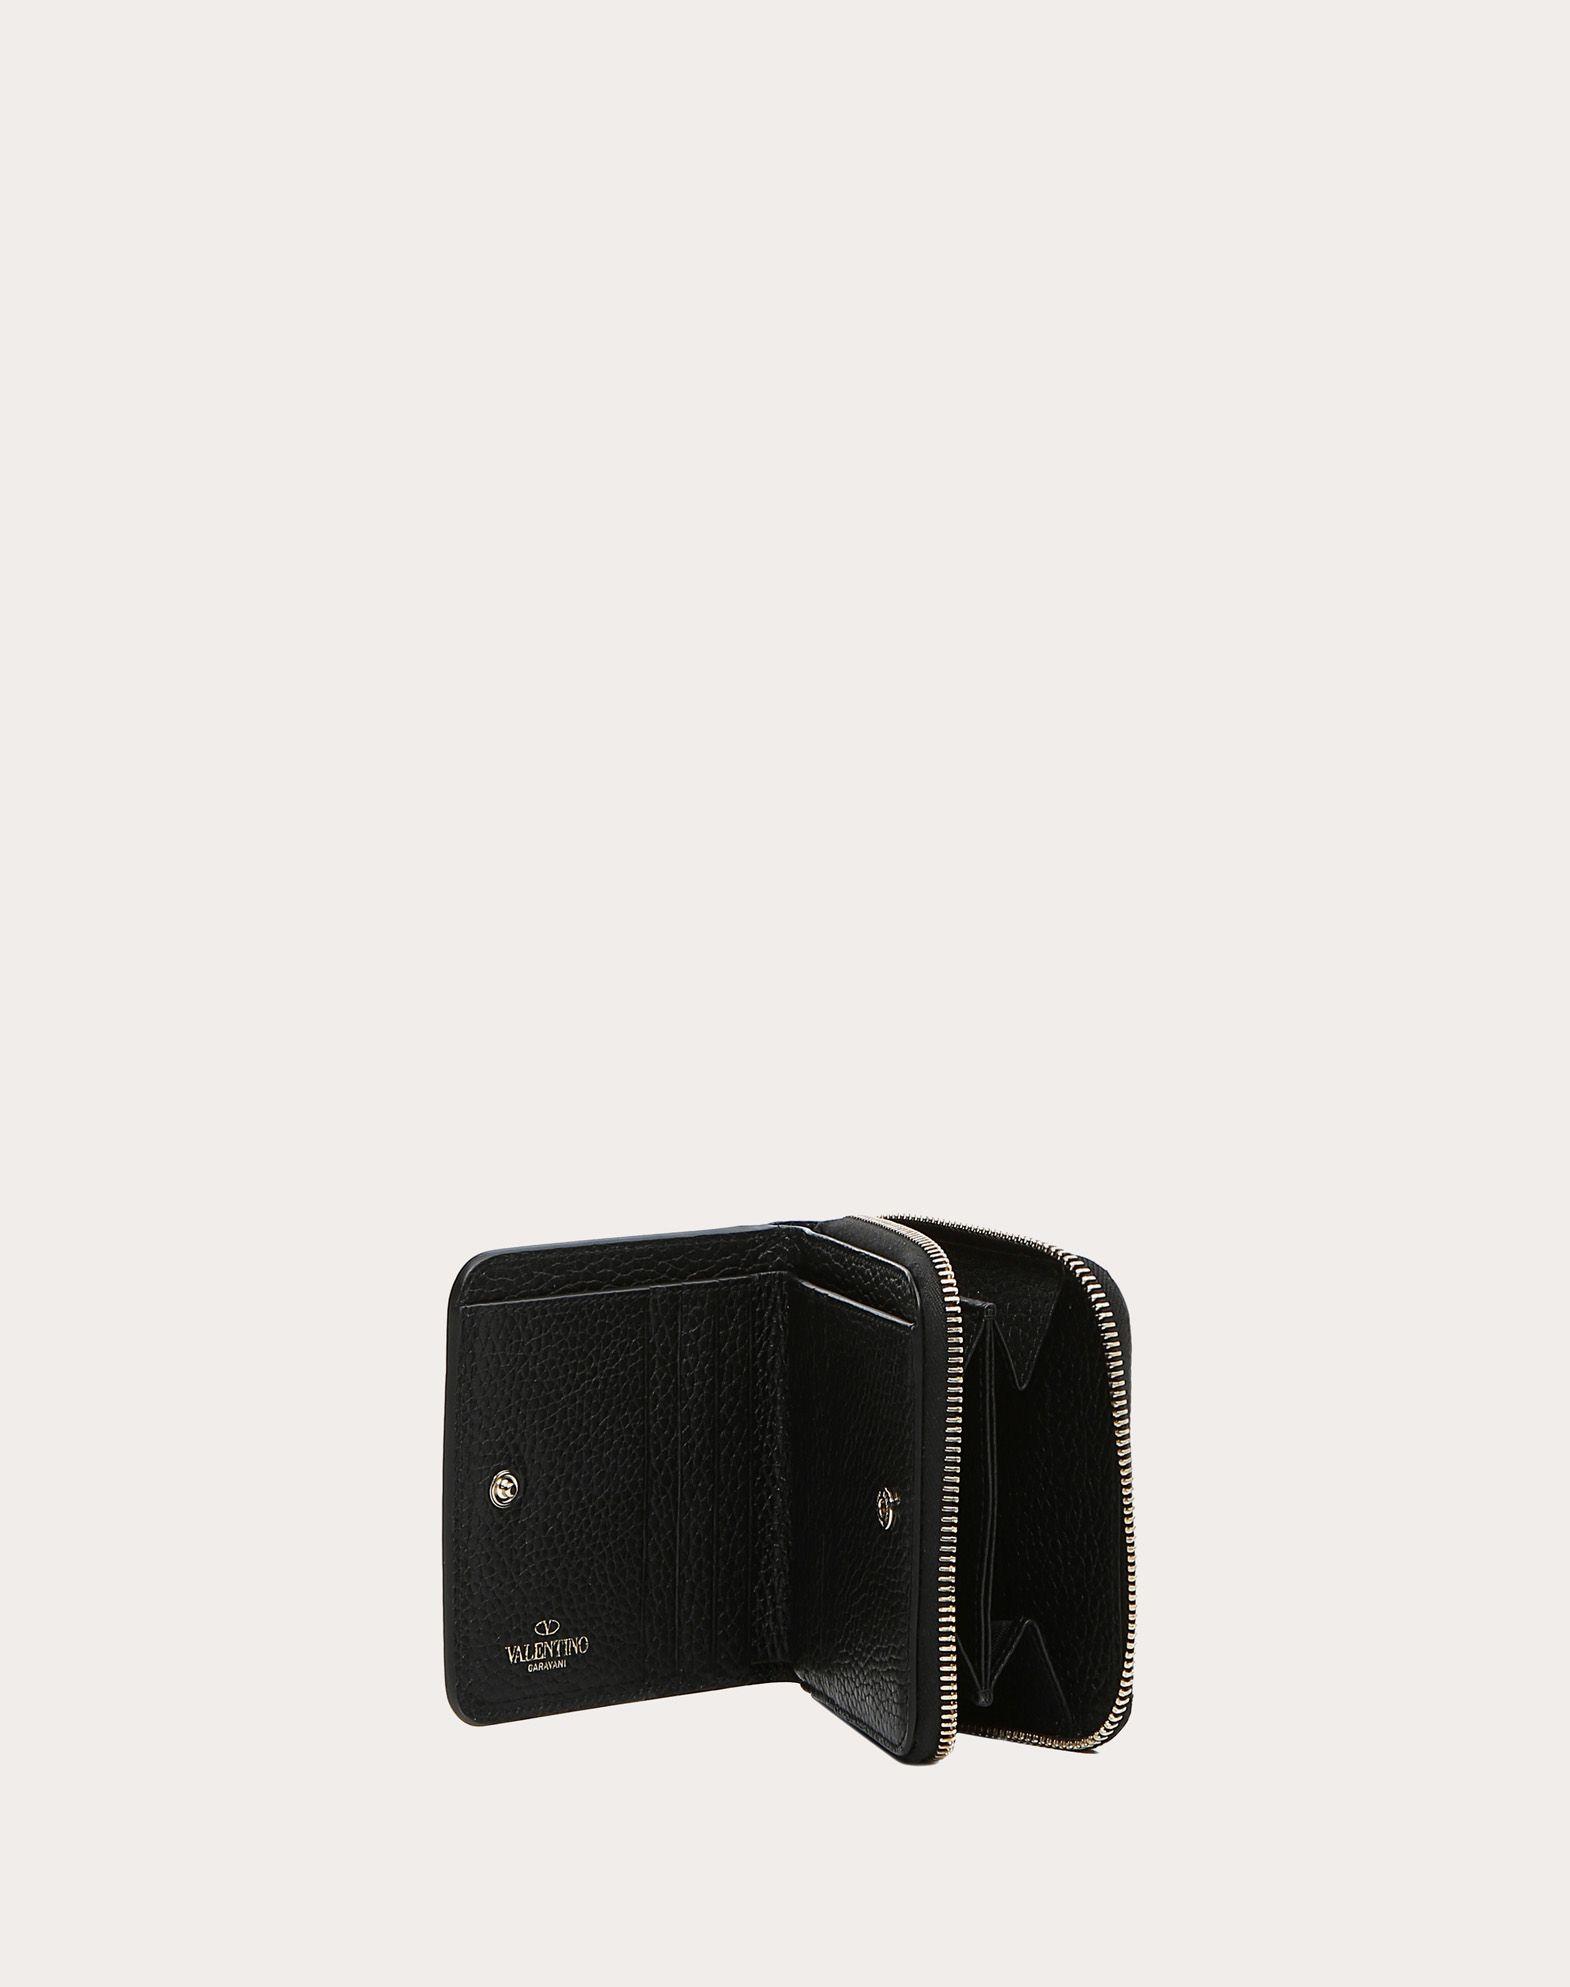 VALENTINO GARAVANI Rockstud Compact Wallet COMPACT WALLETS D a